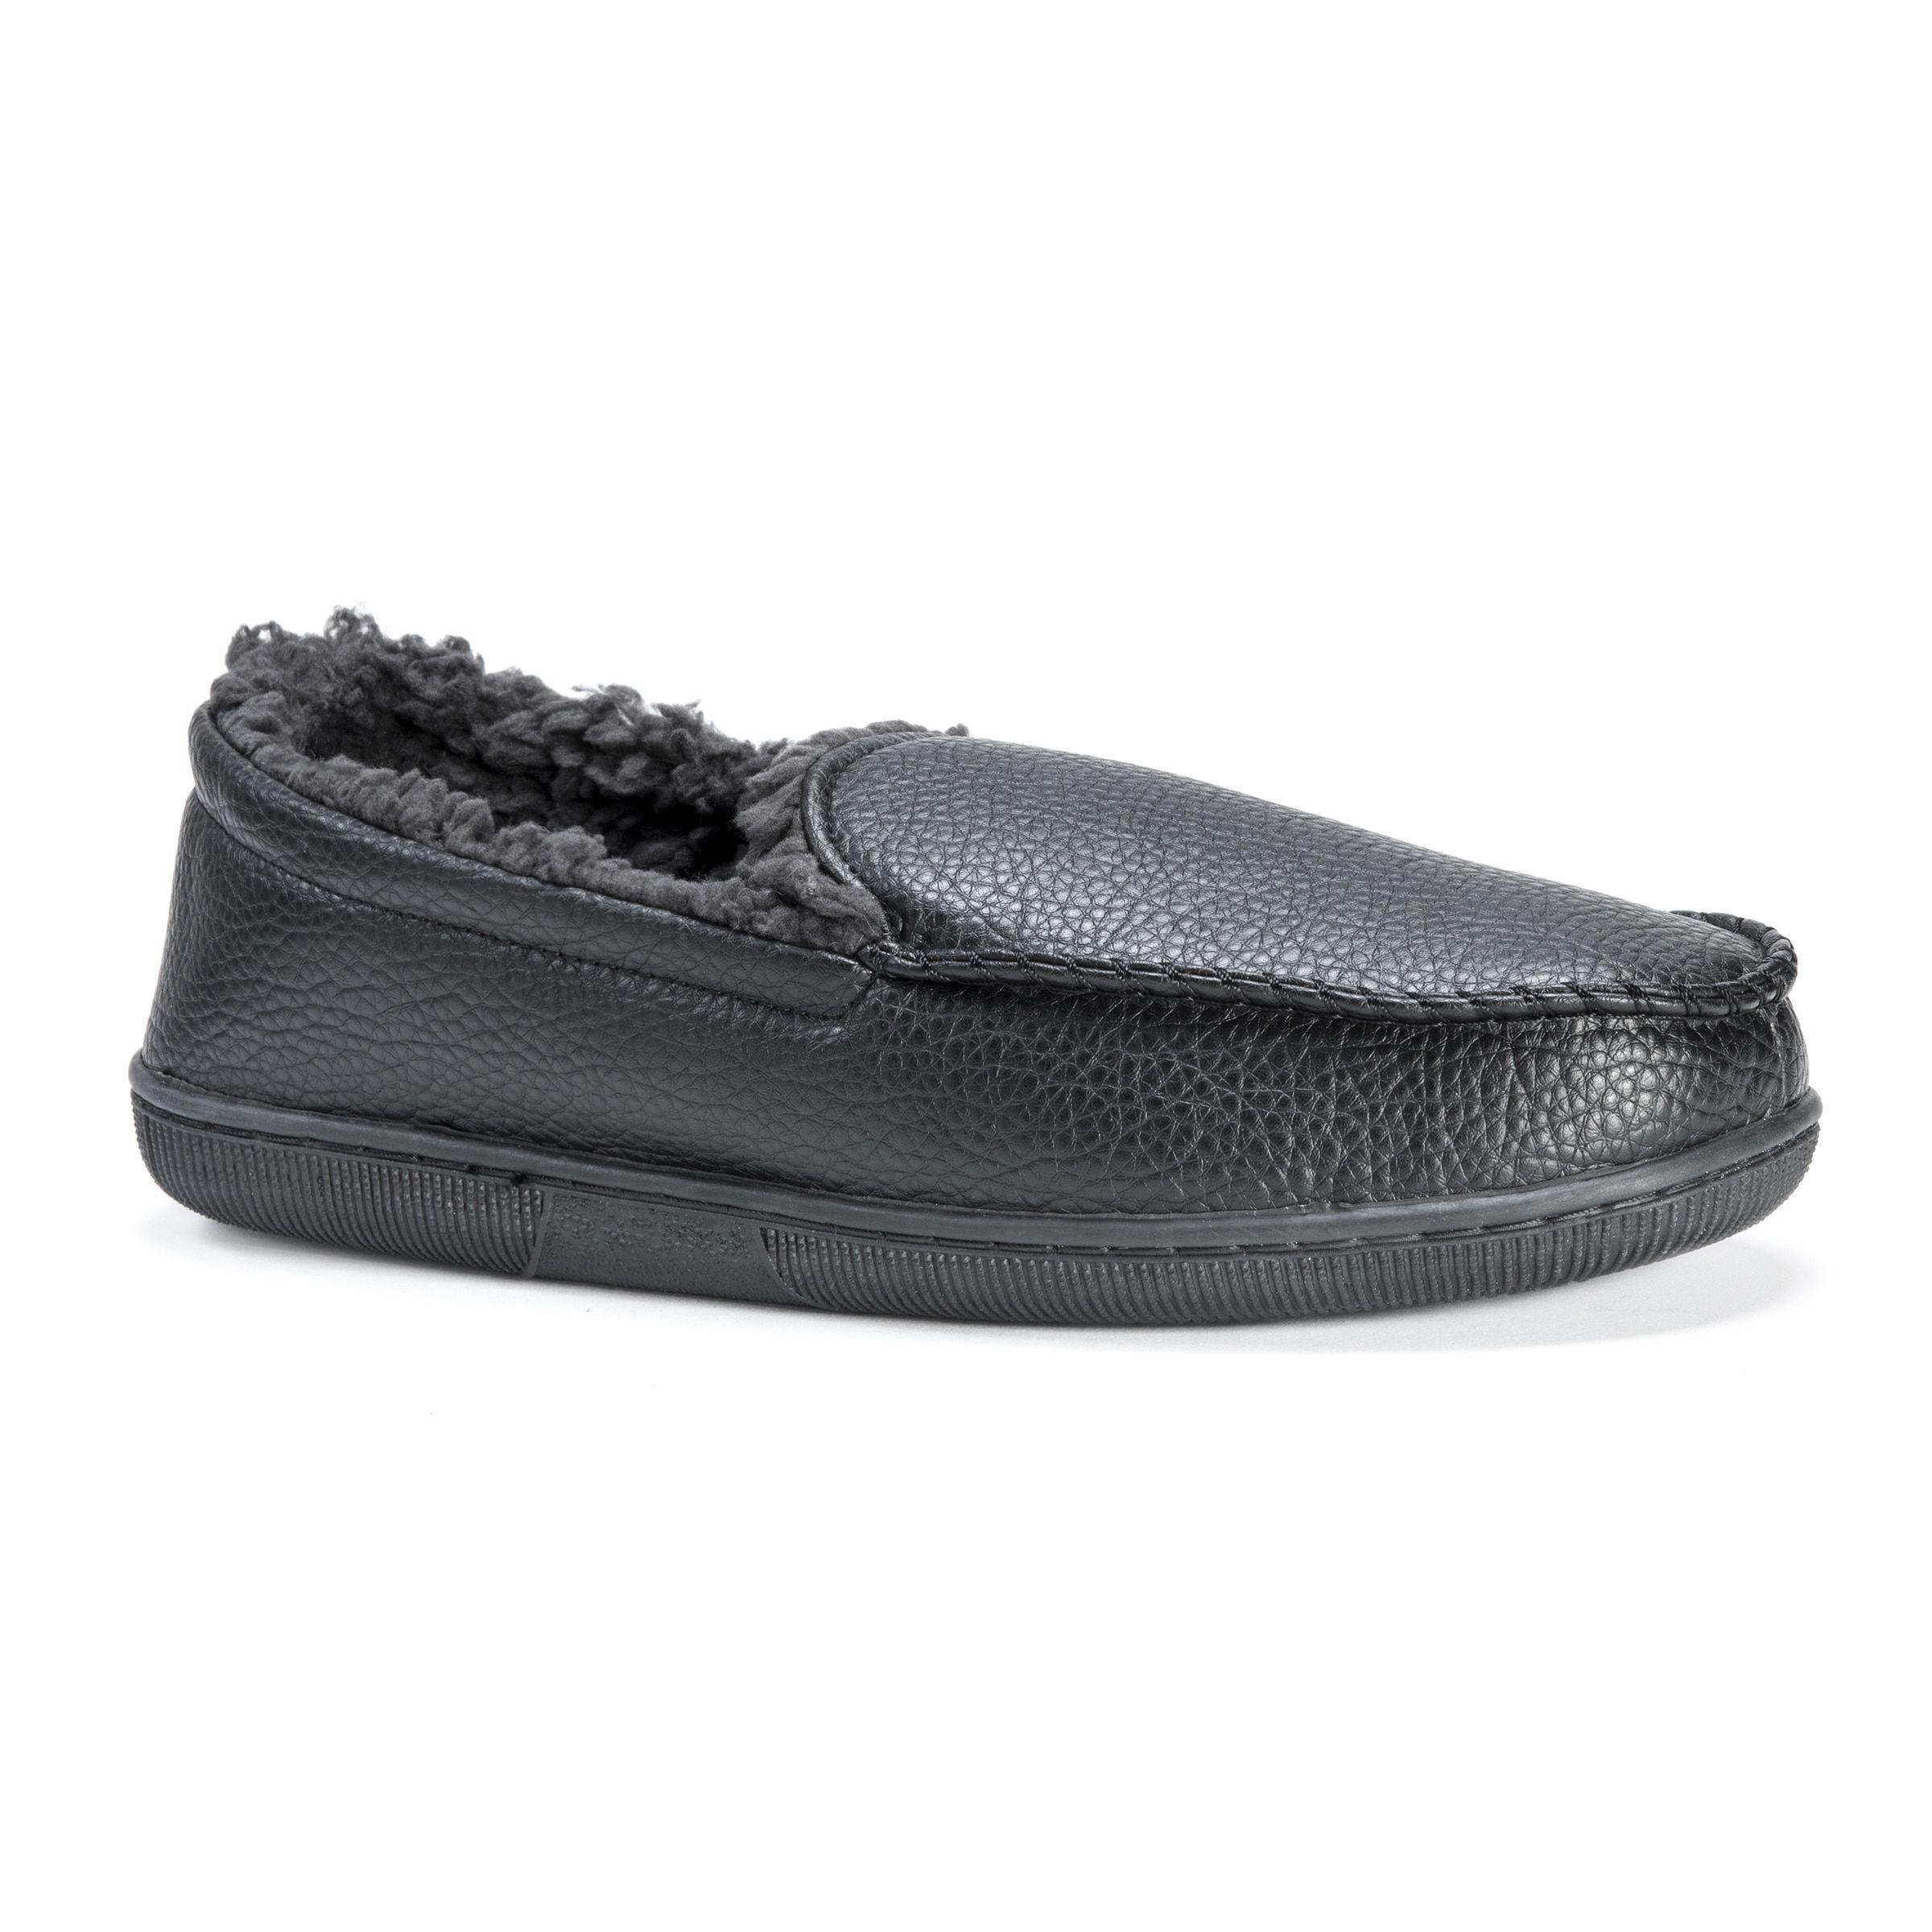 Muk Luks Men's /Polyurethane Moccasin Slippers